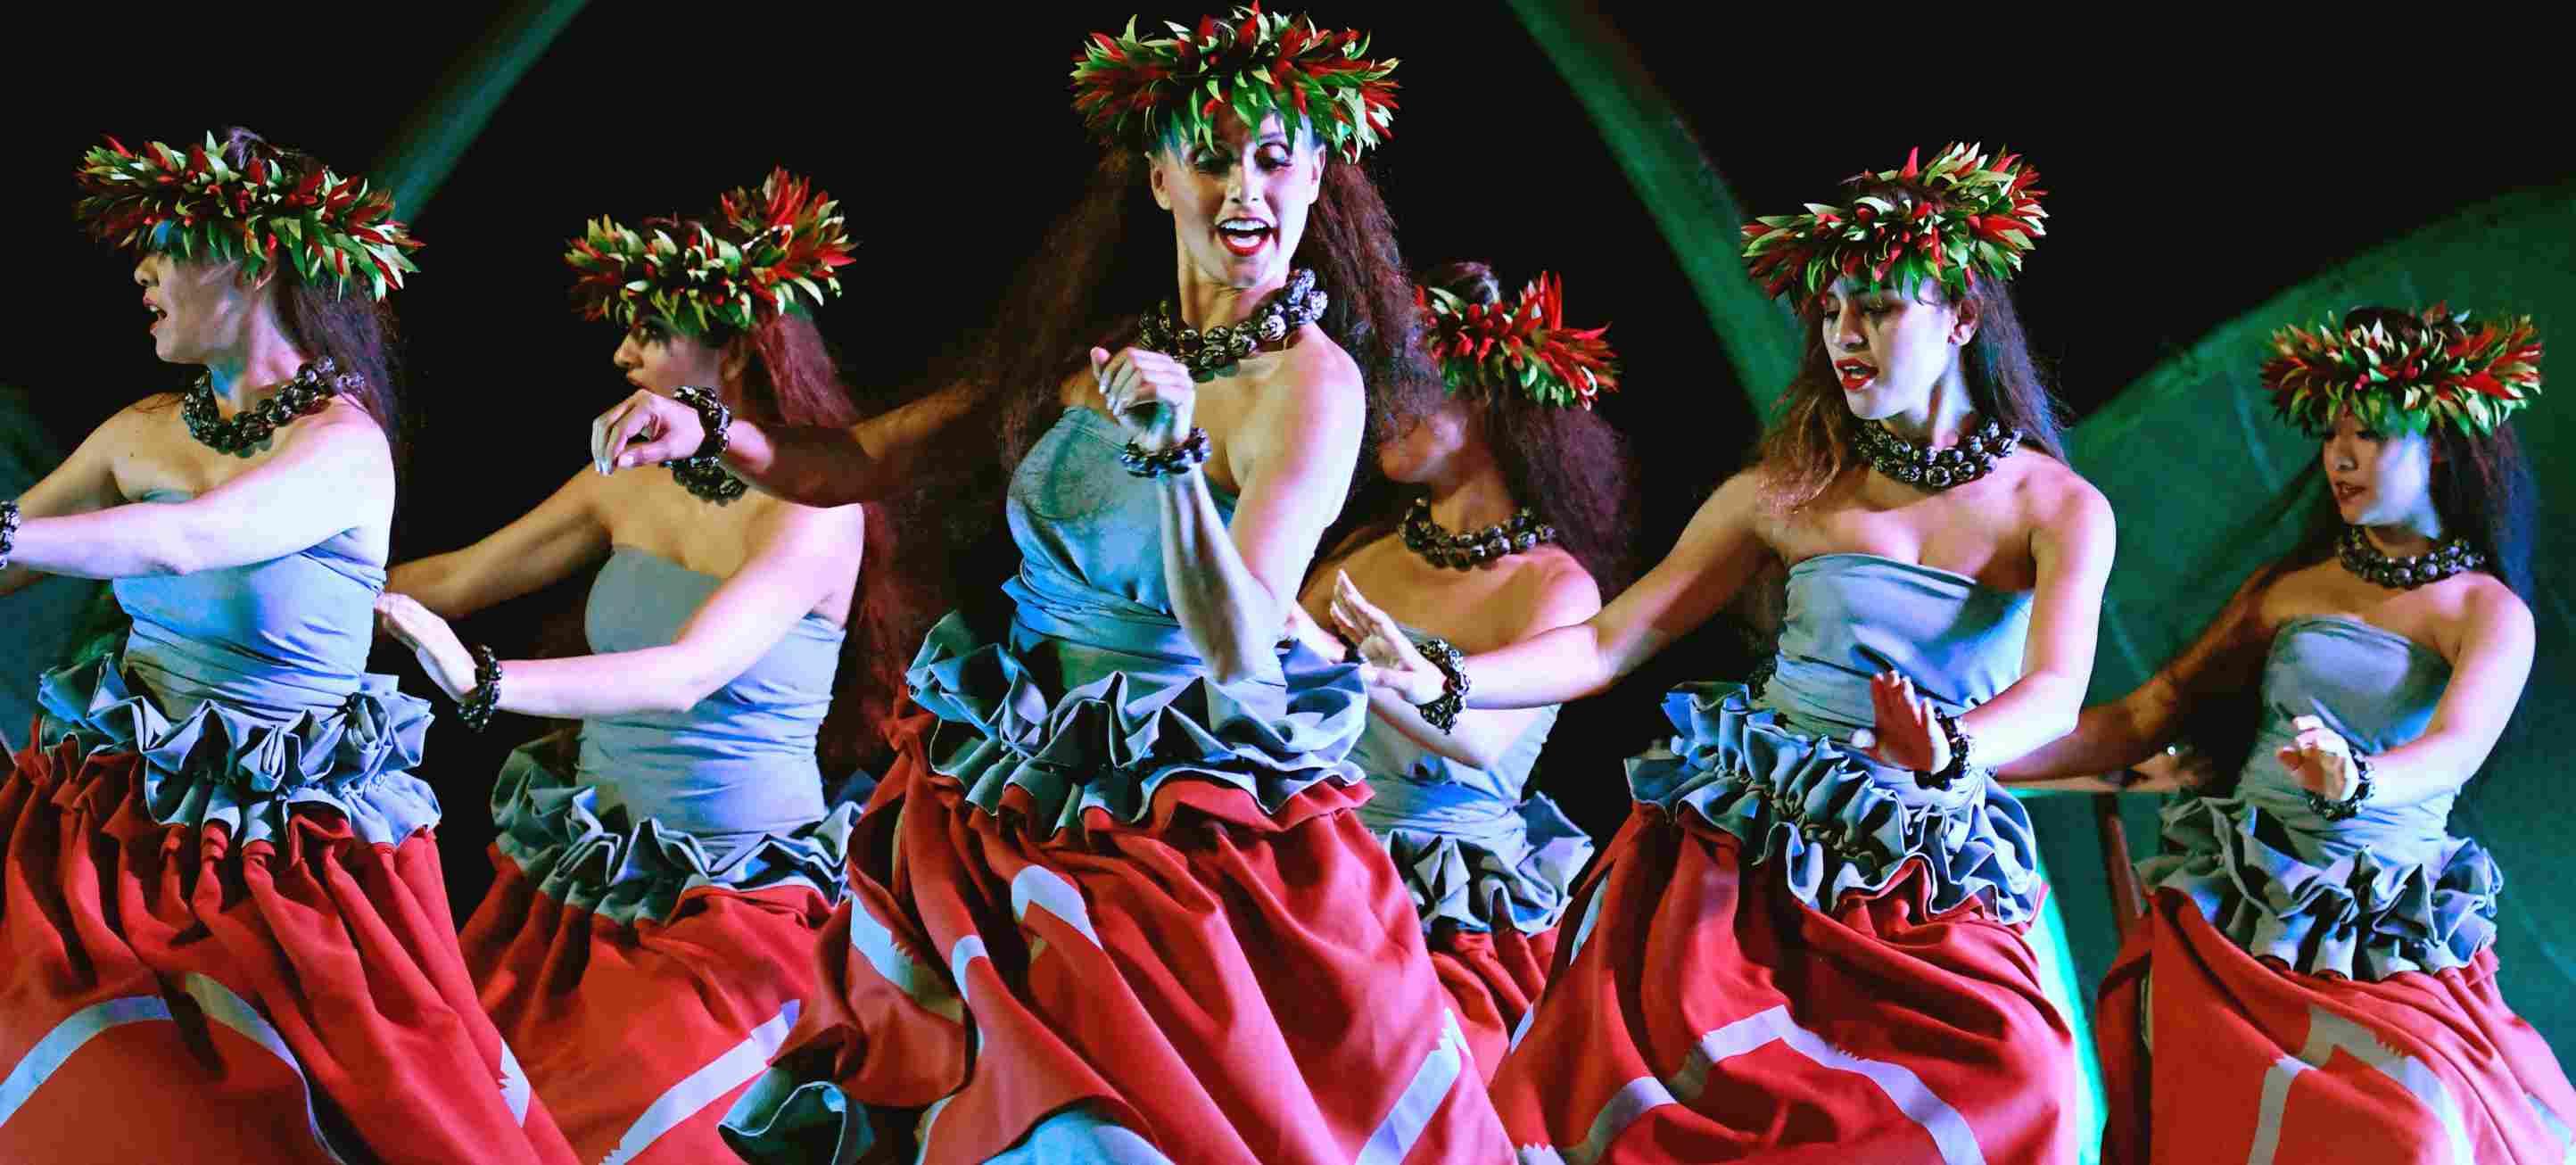 Dancers at the KA WA'A Luau at Disney Aulani Resort